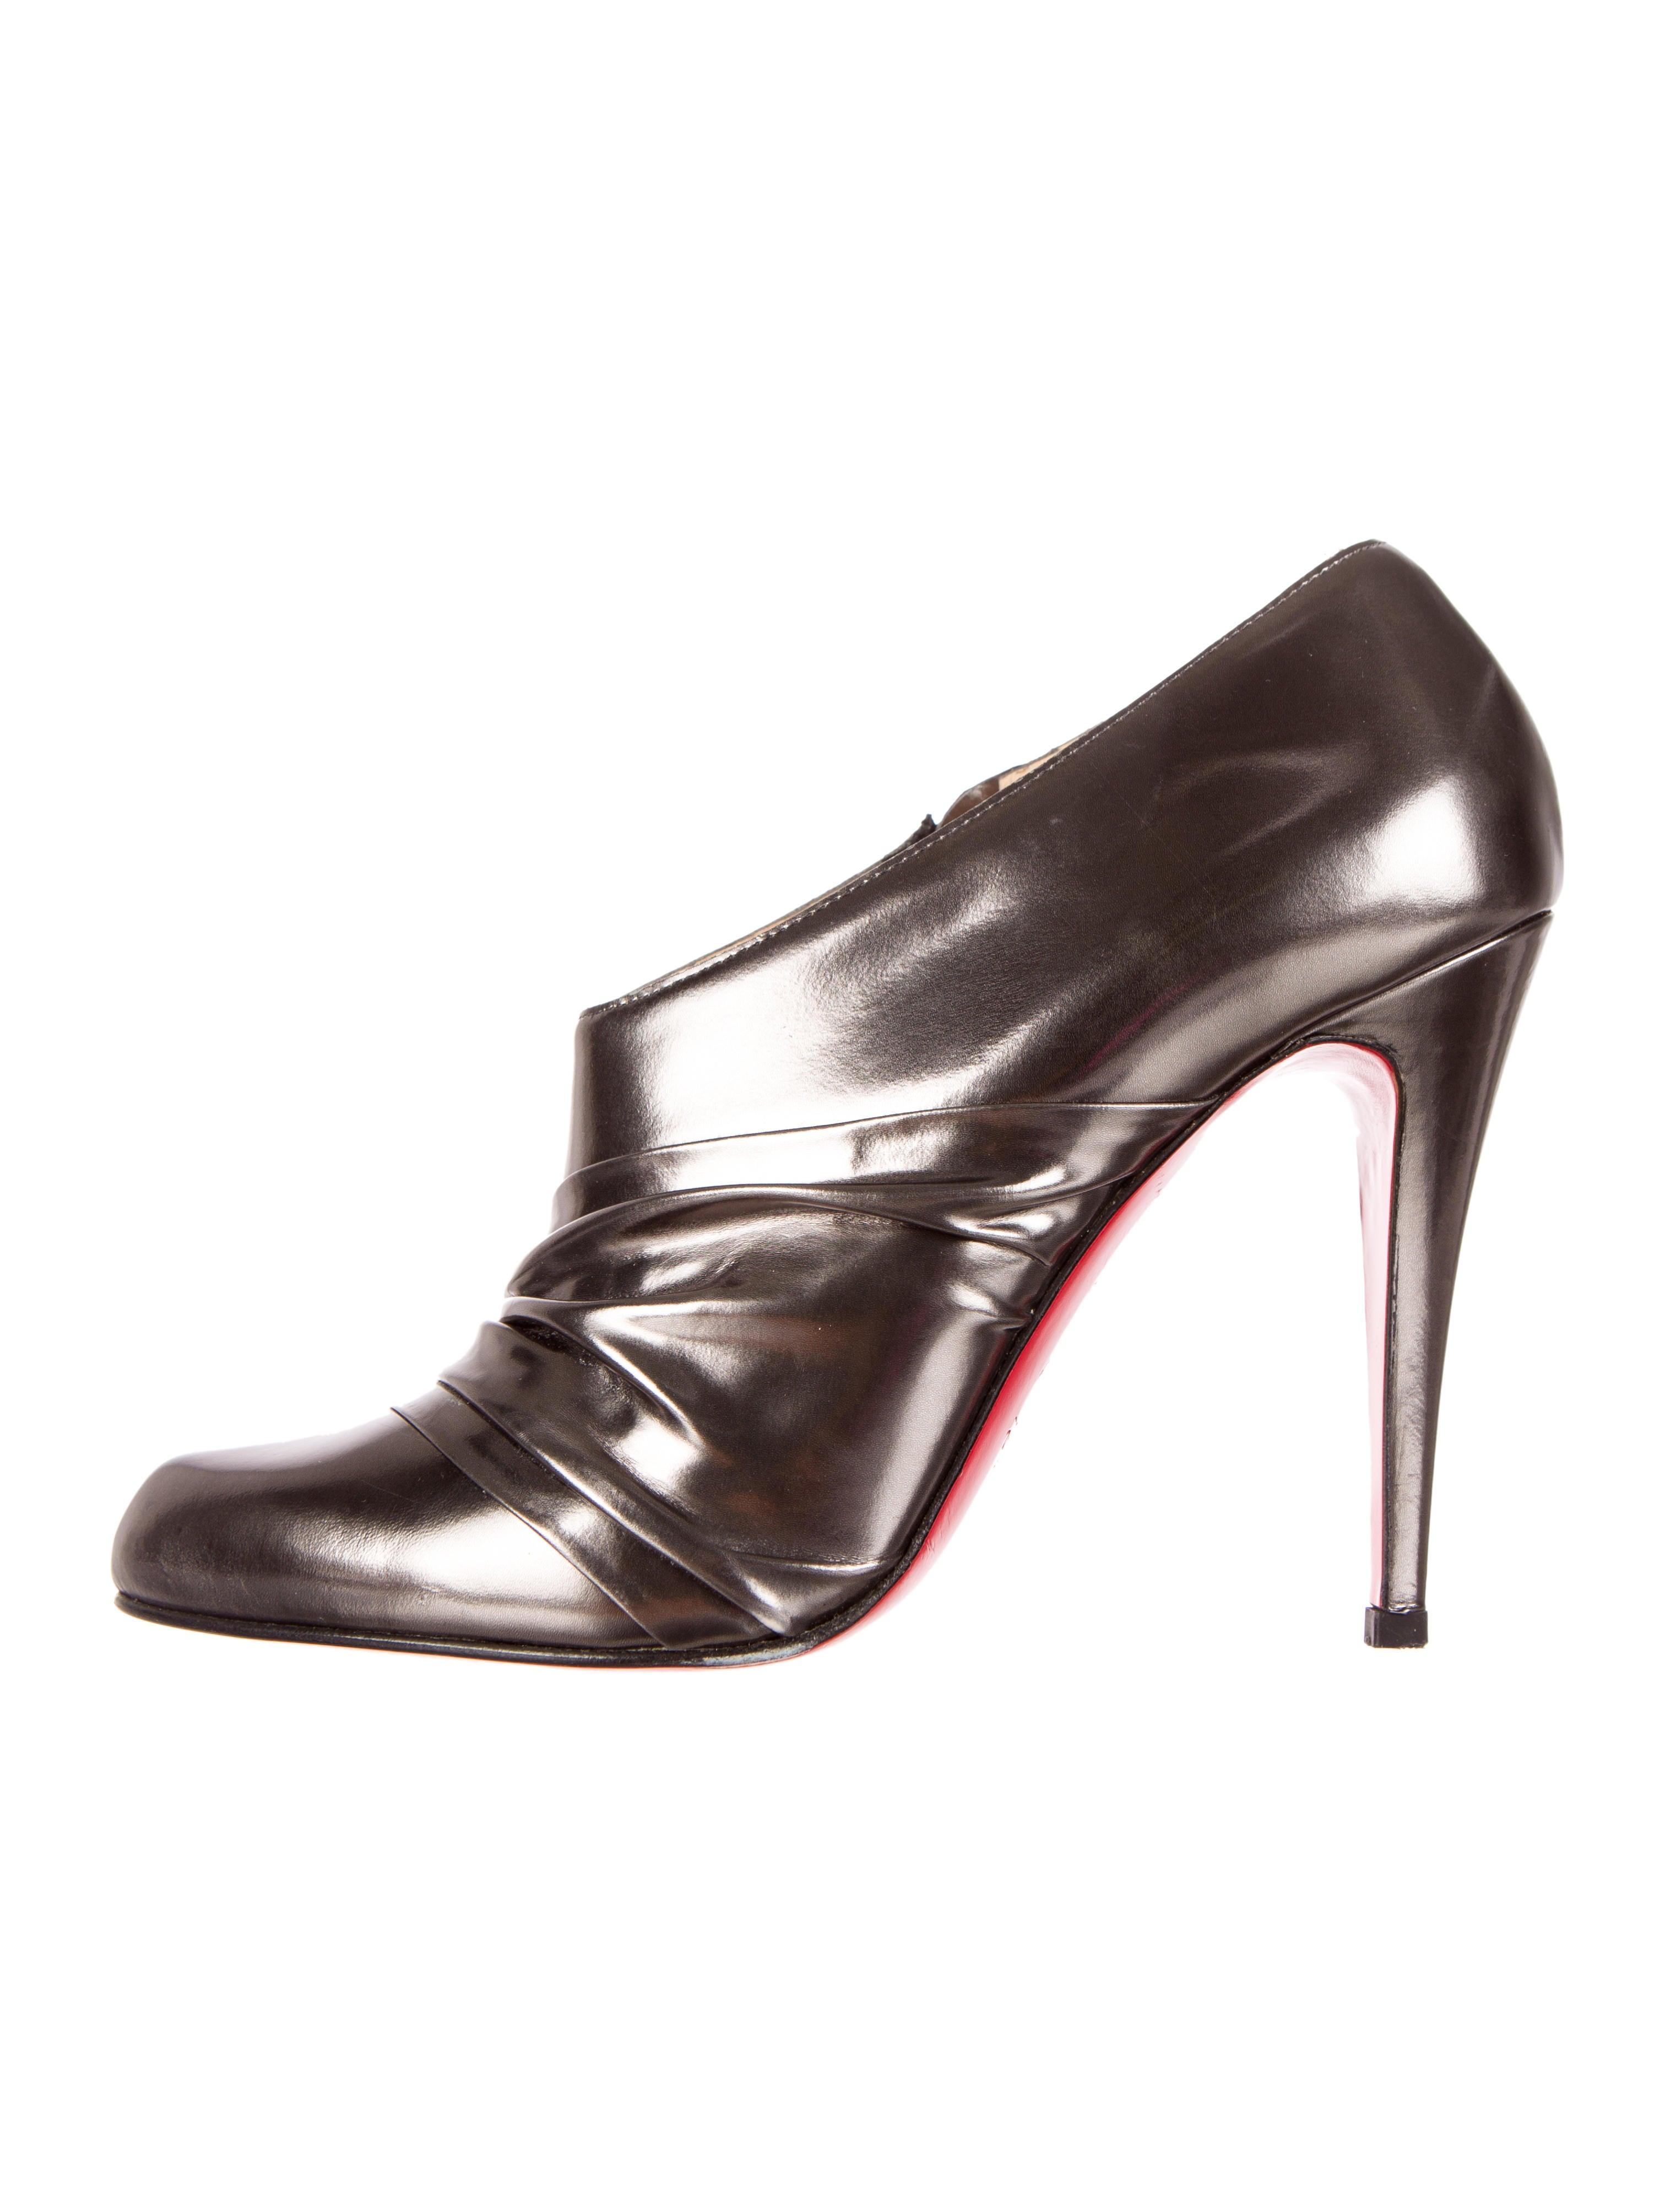 christian louboutin mens sneakers - Artesur ? christian louboutin Metallika booties Gunmetal leather ...